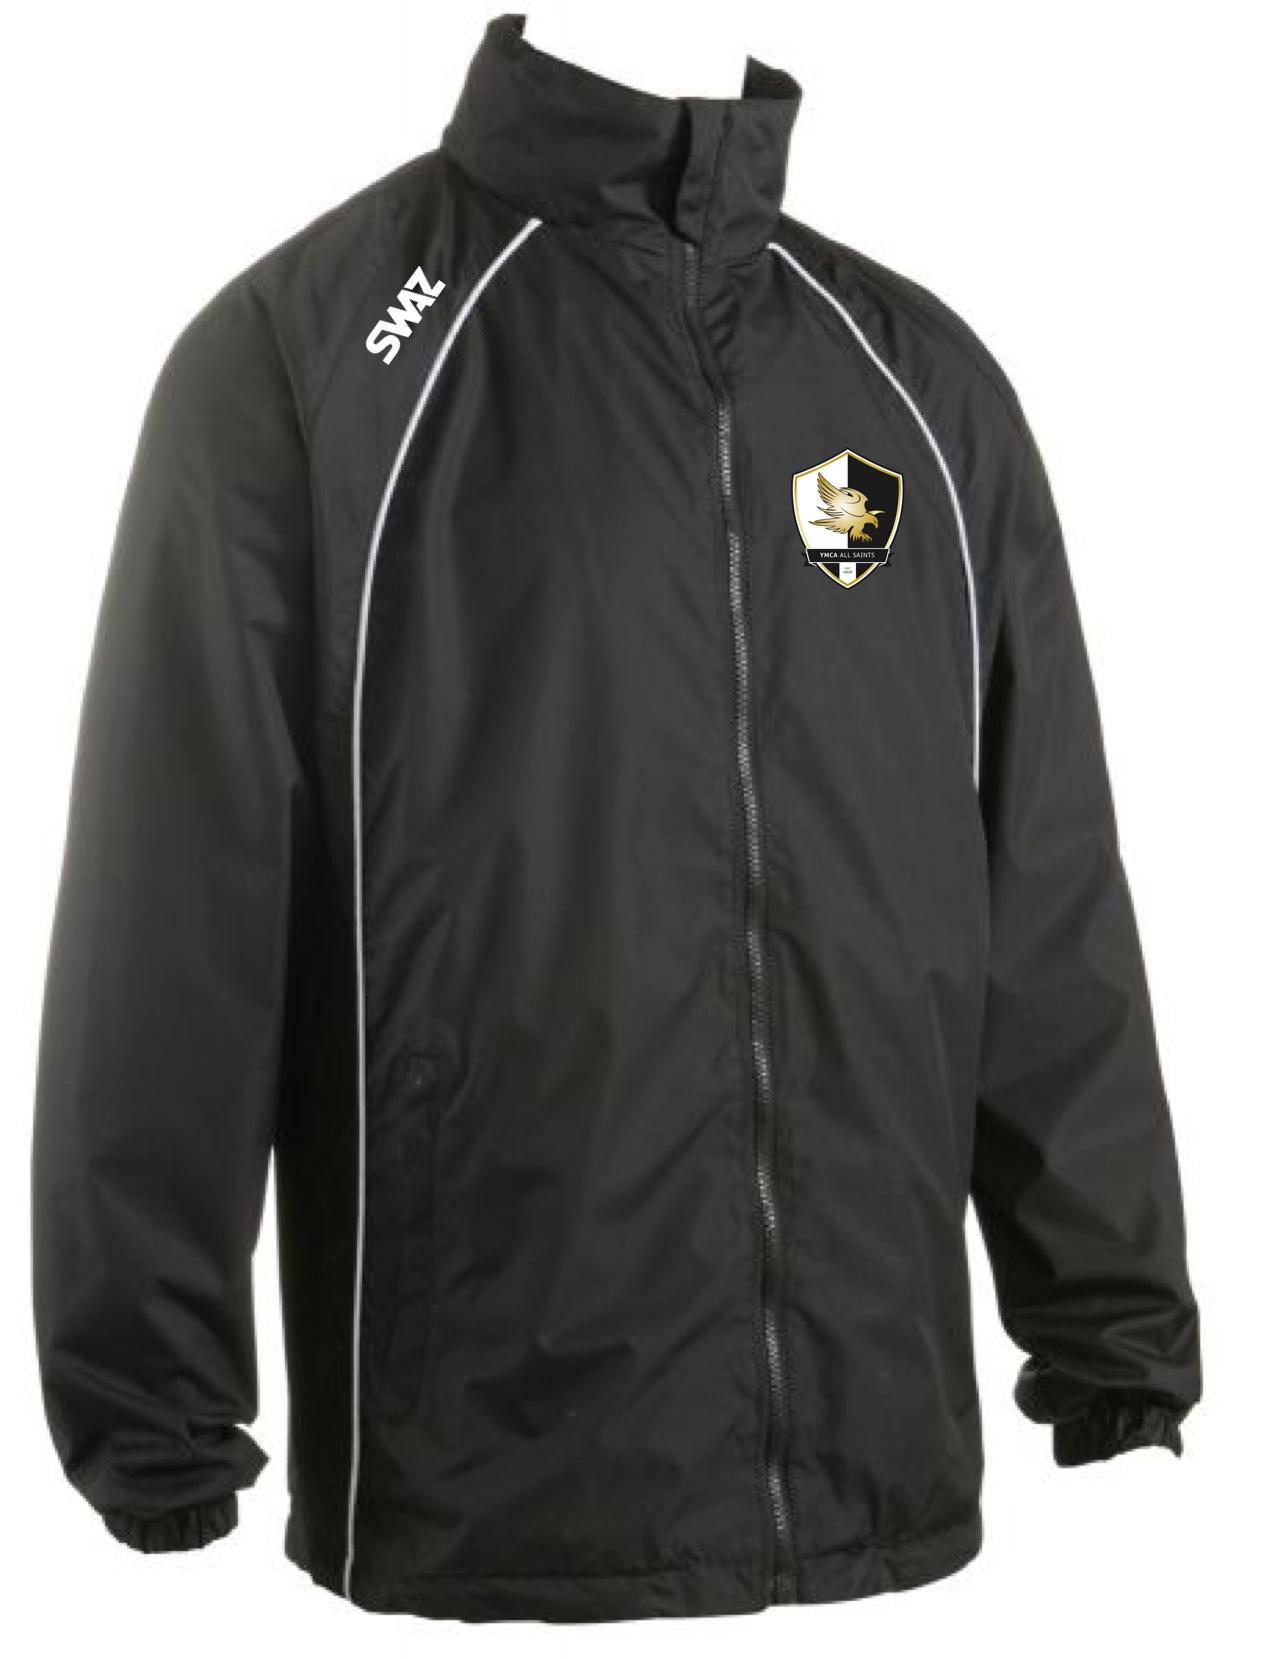 SWAZ YMCA All Saints Adult Showerproof Jacket – Black